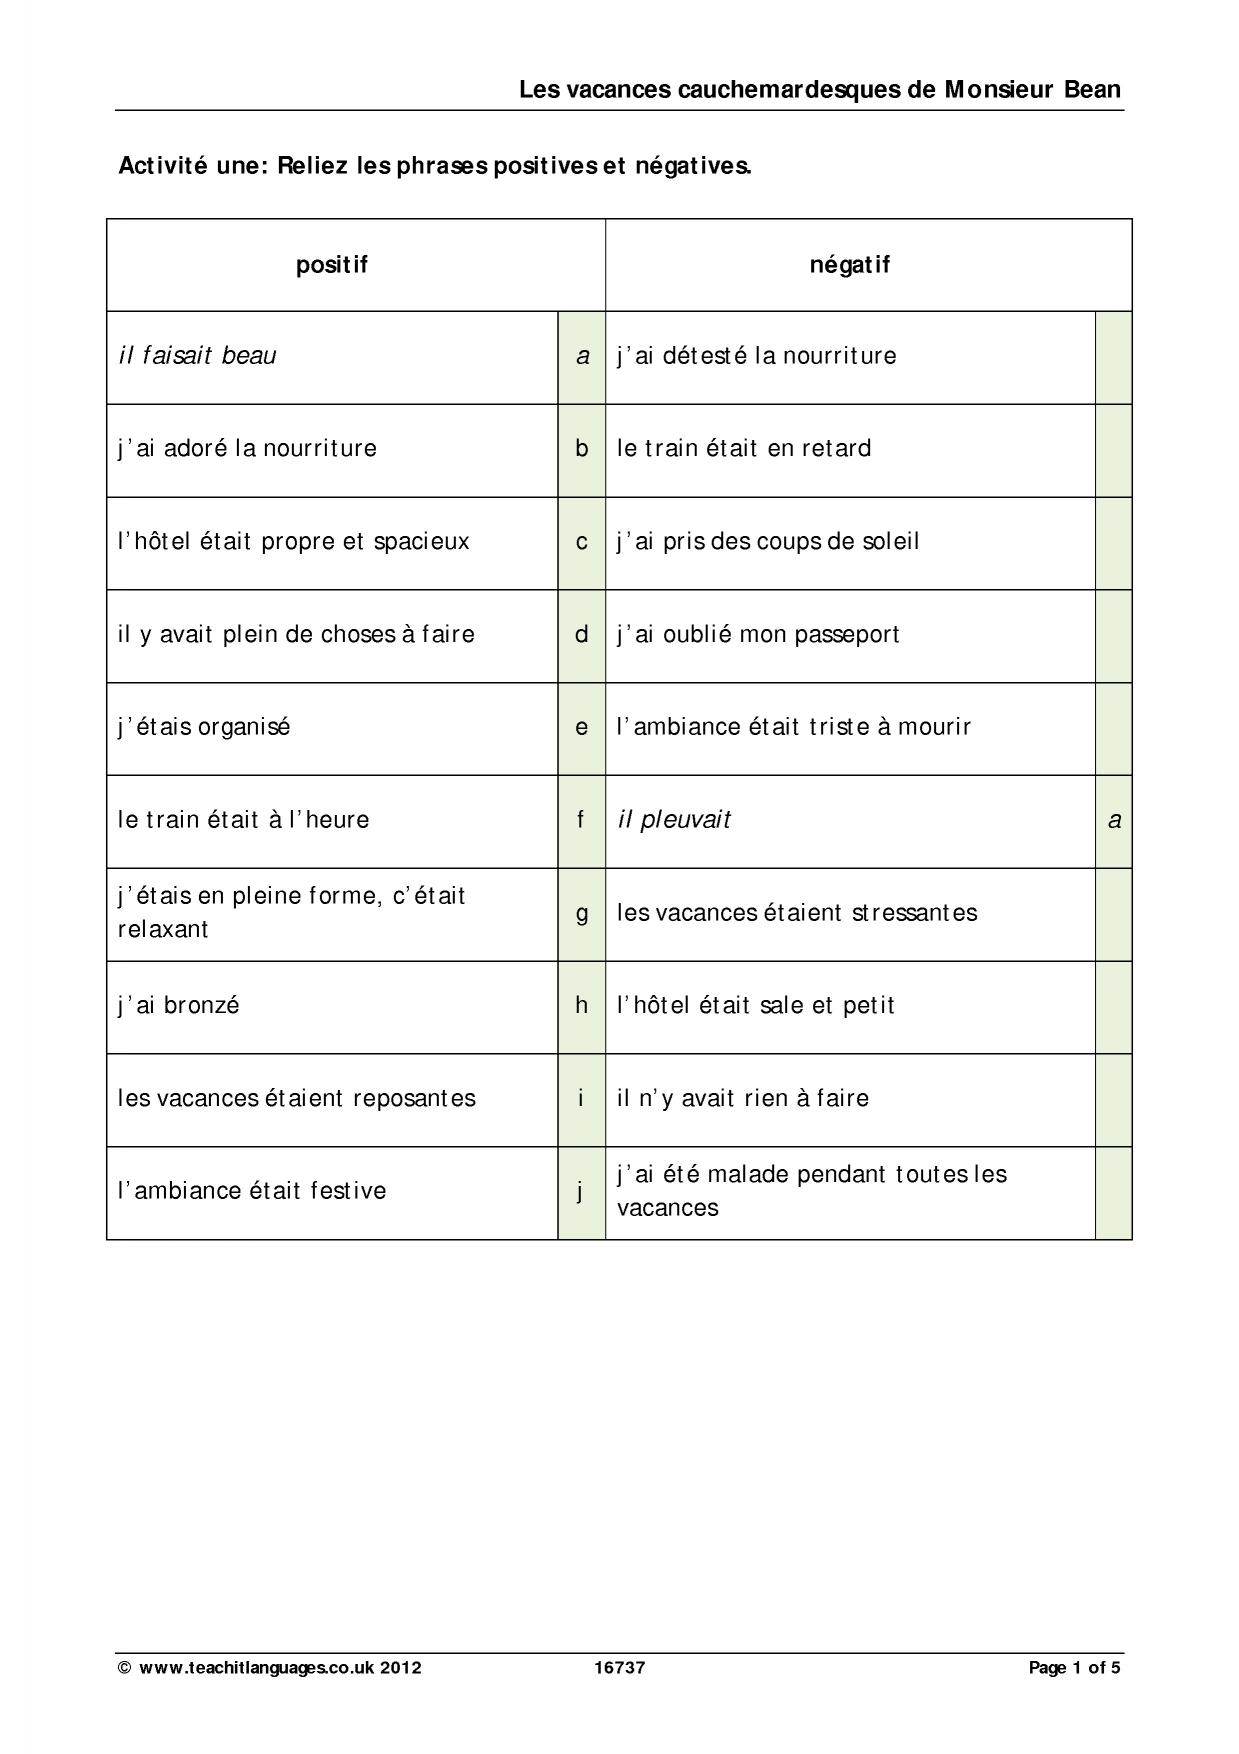 grammar key stage 4 french skills key stage 4 french resources mfl resources. Black Bedroom Furniture Sets. Home Design Ideas